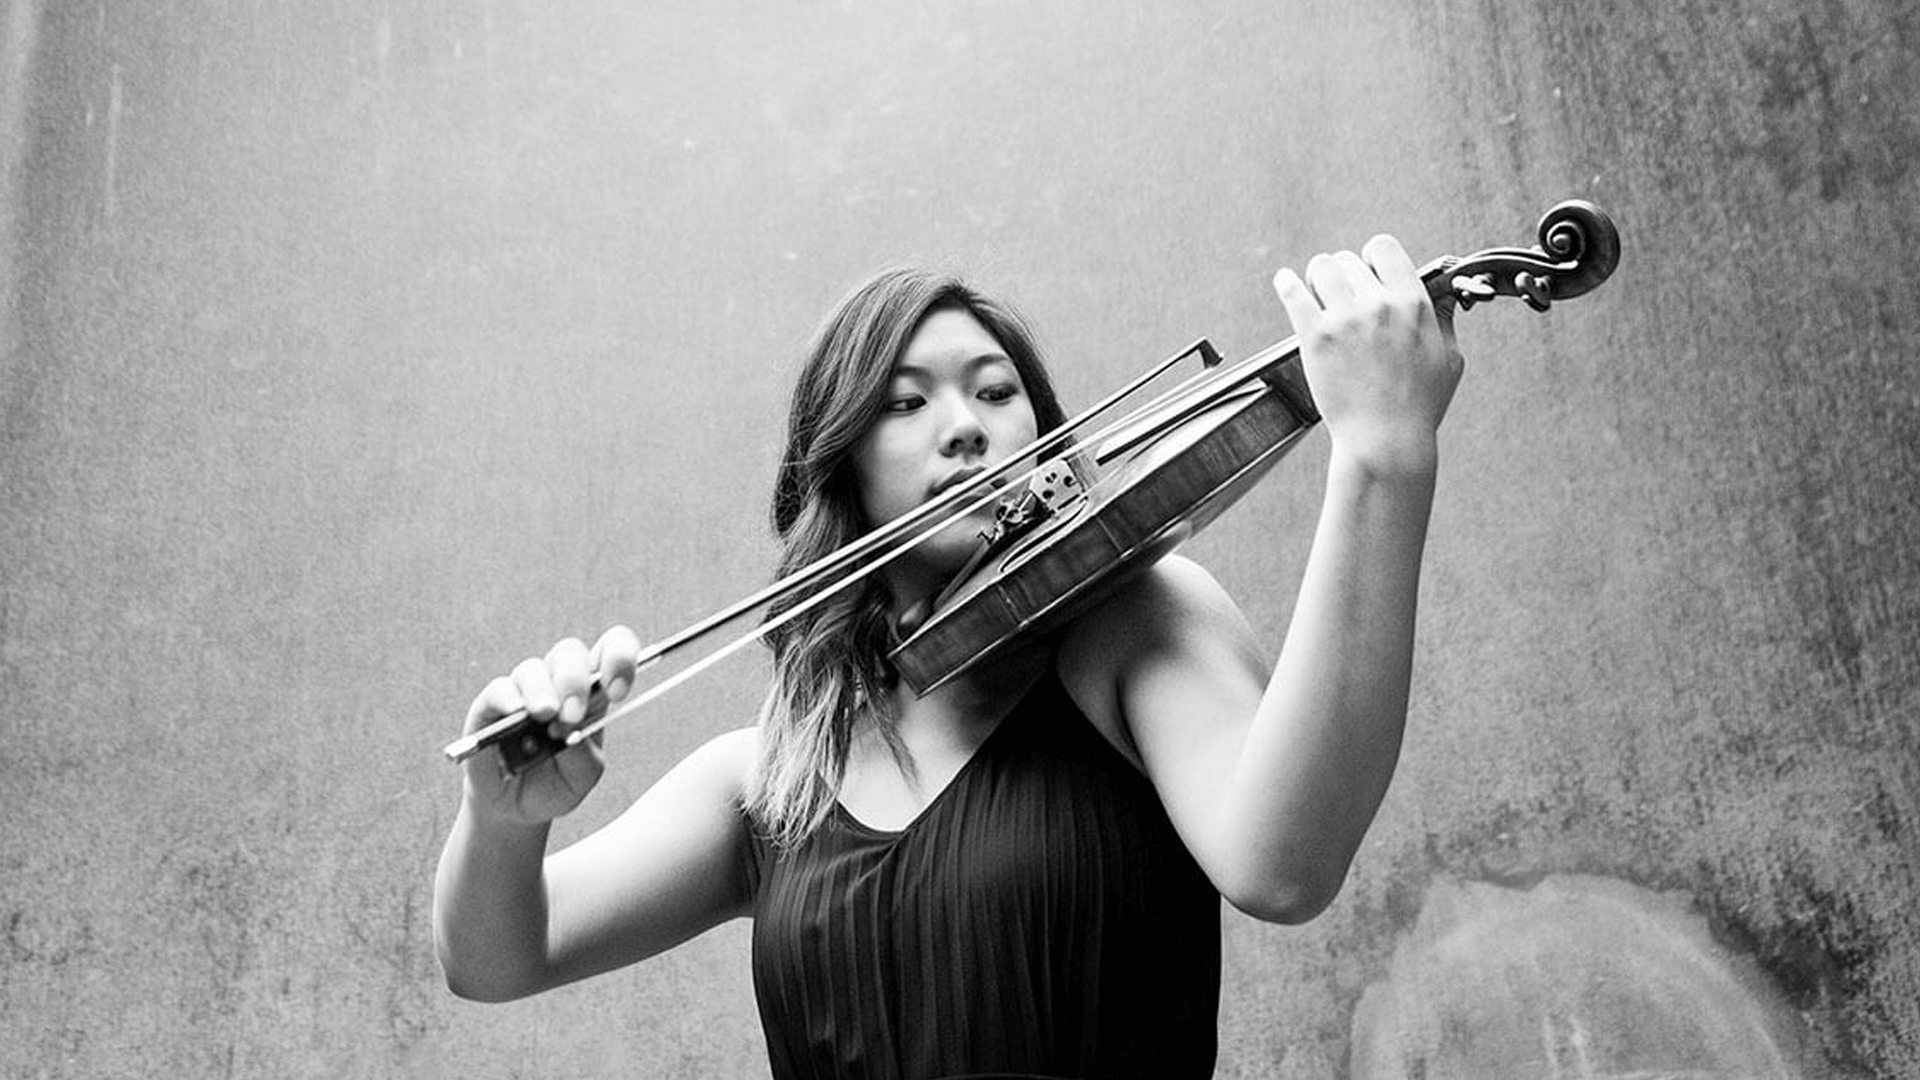 Violin - The UCLA Herb Alpert School of Music